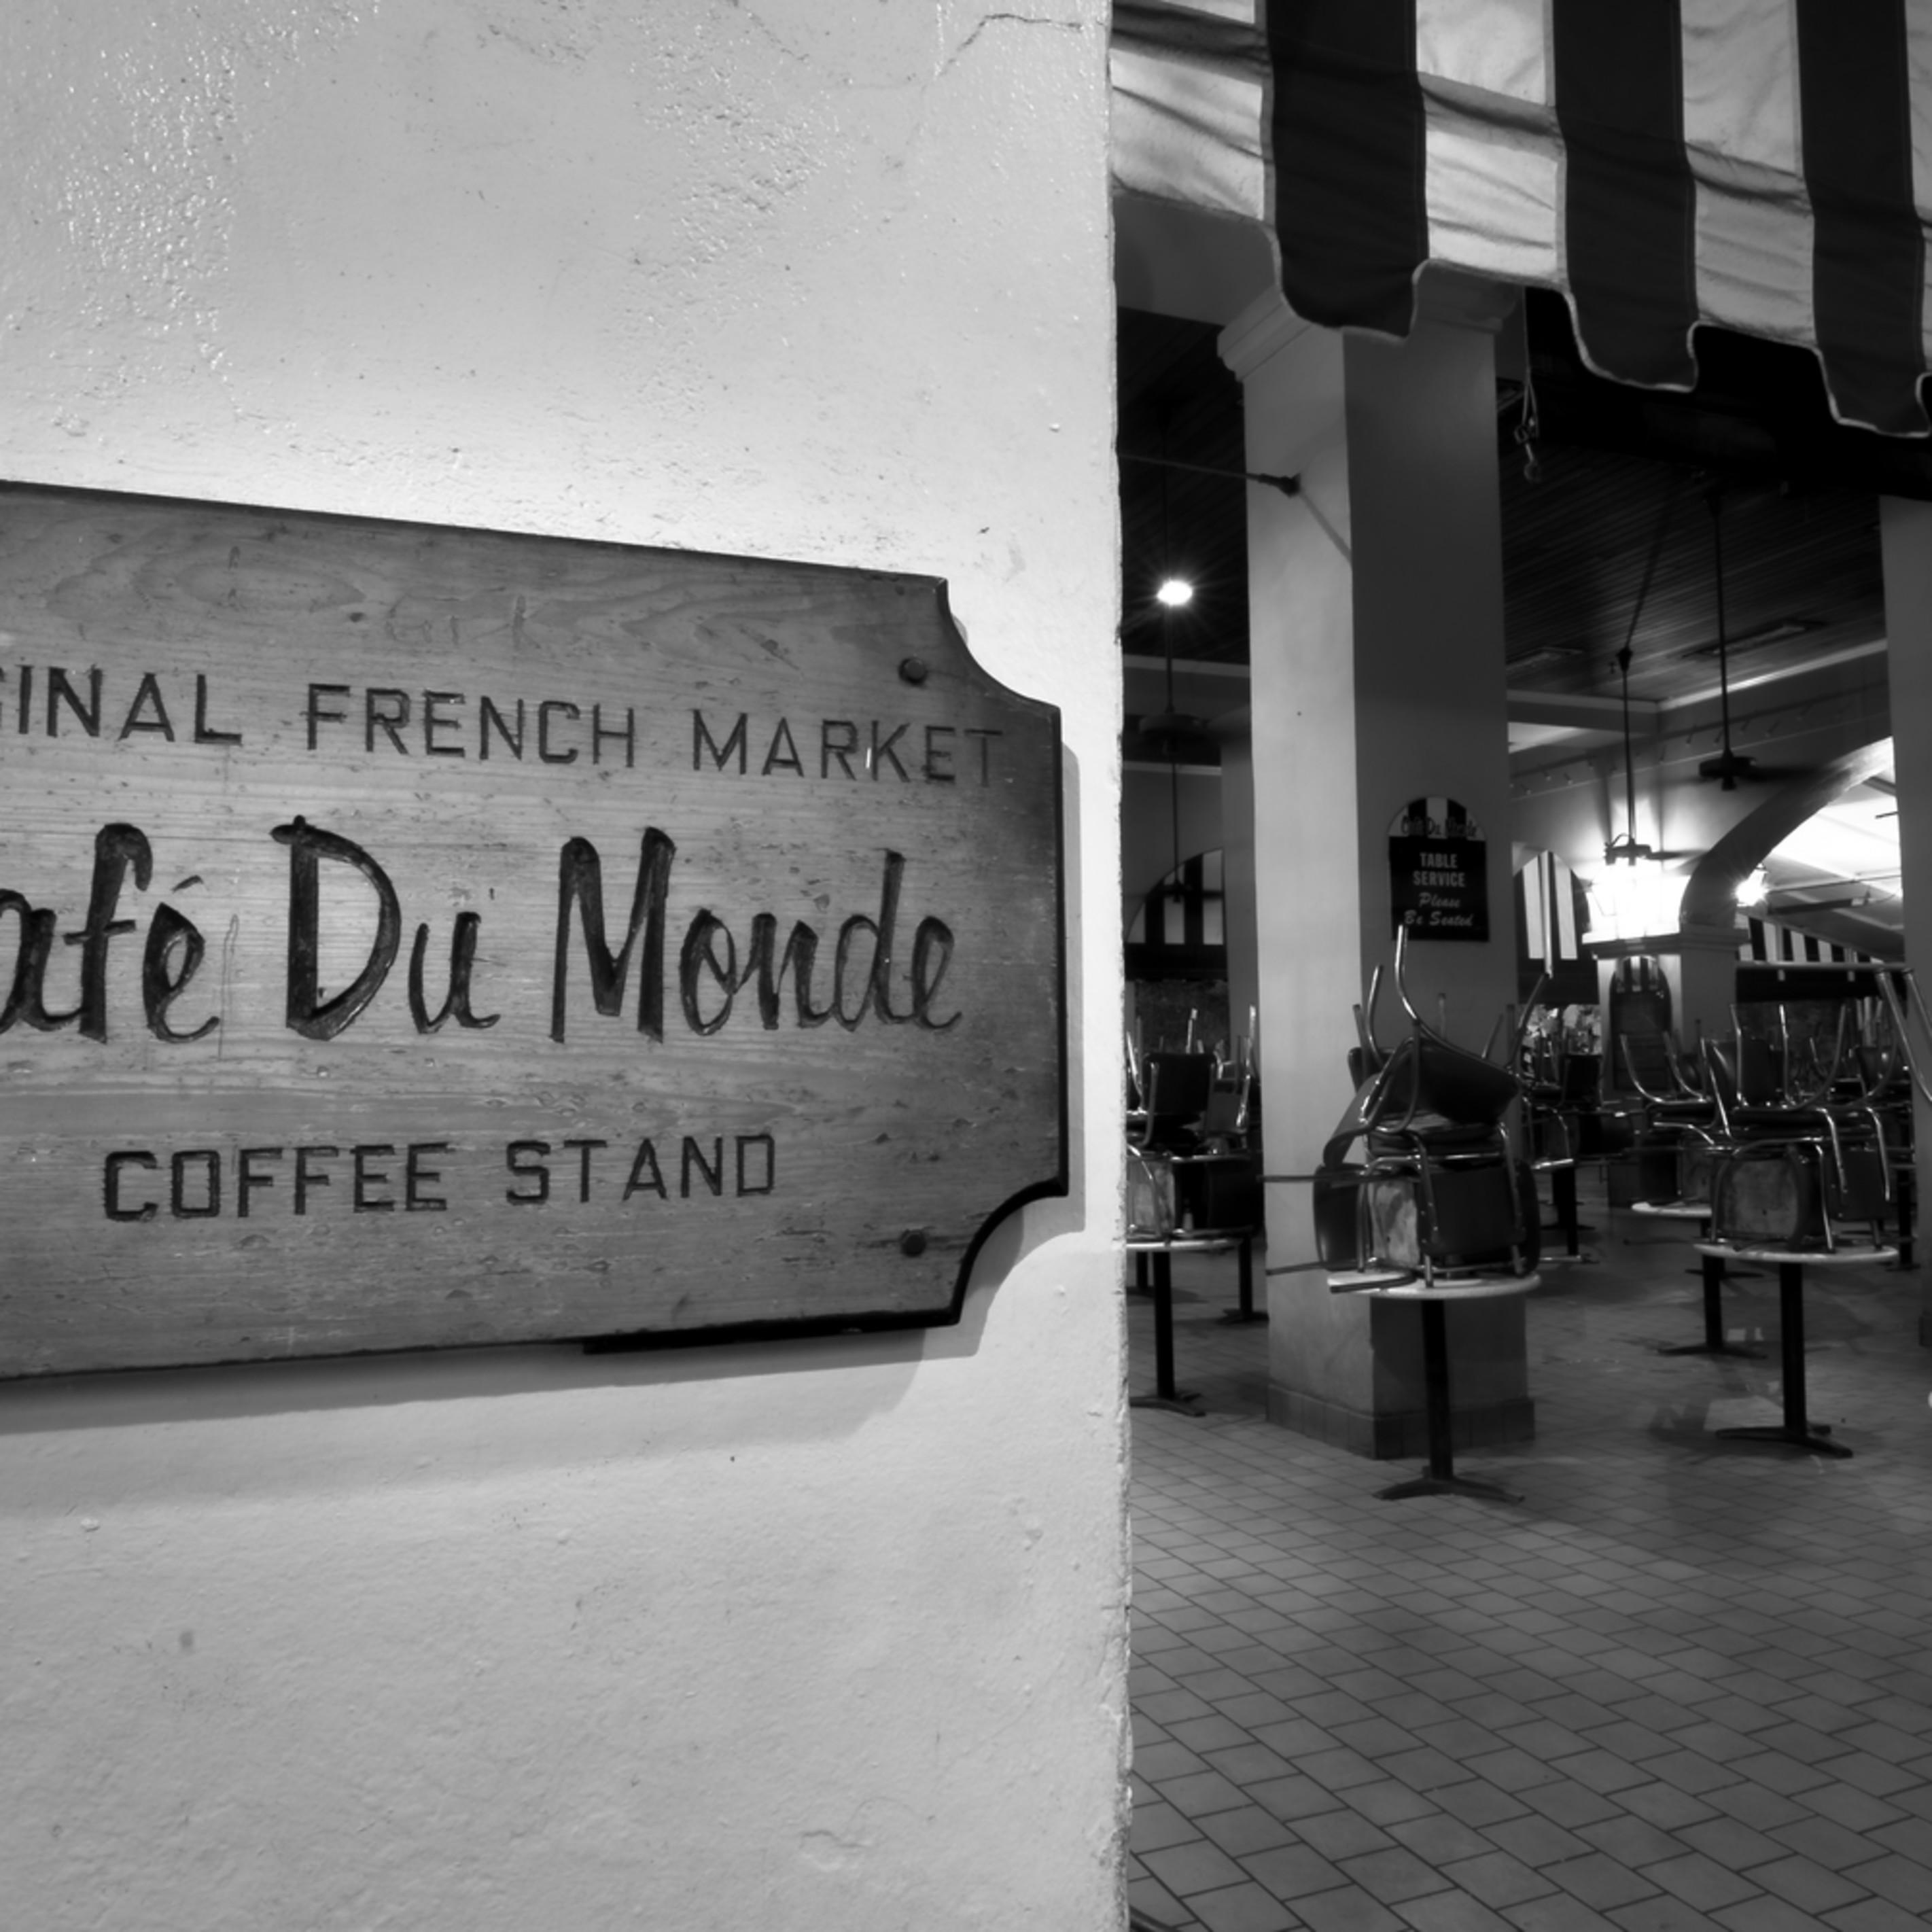 New orleans cafe du monde 0514 1 lumamm